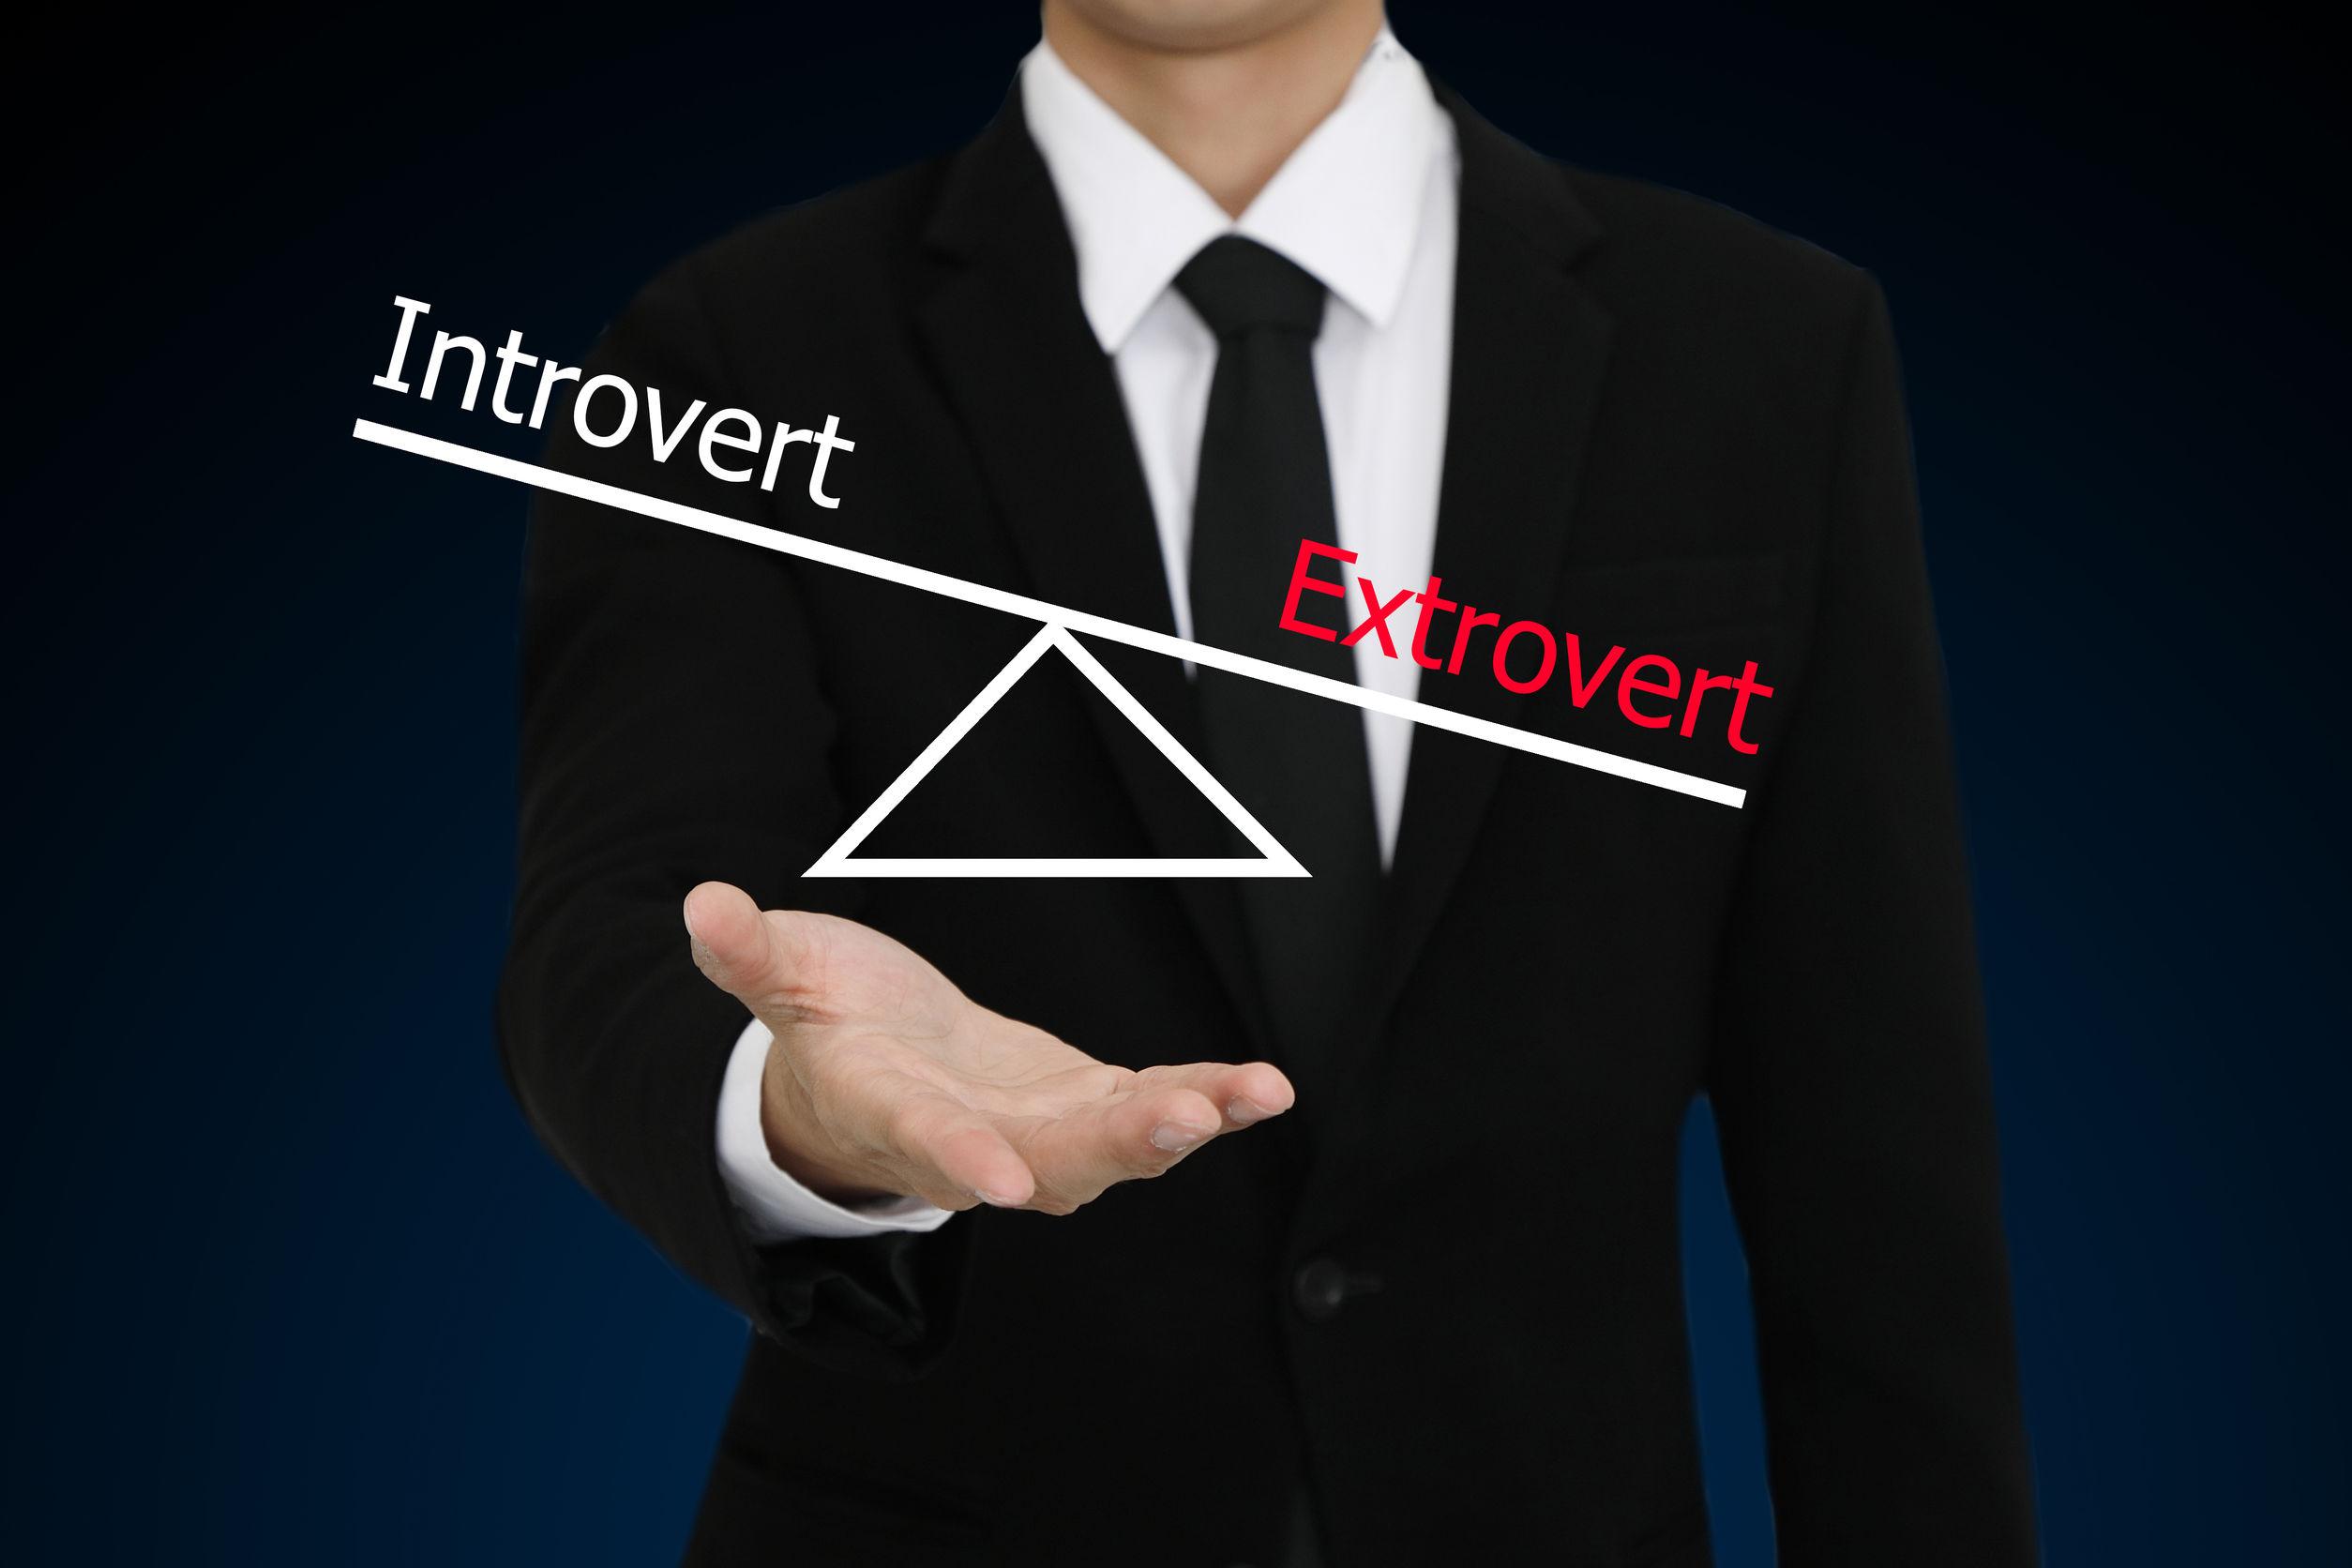 introvert-extrovert-balance